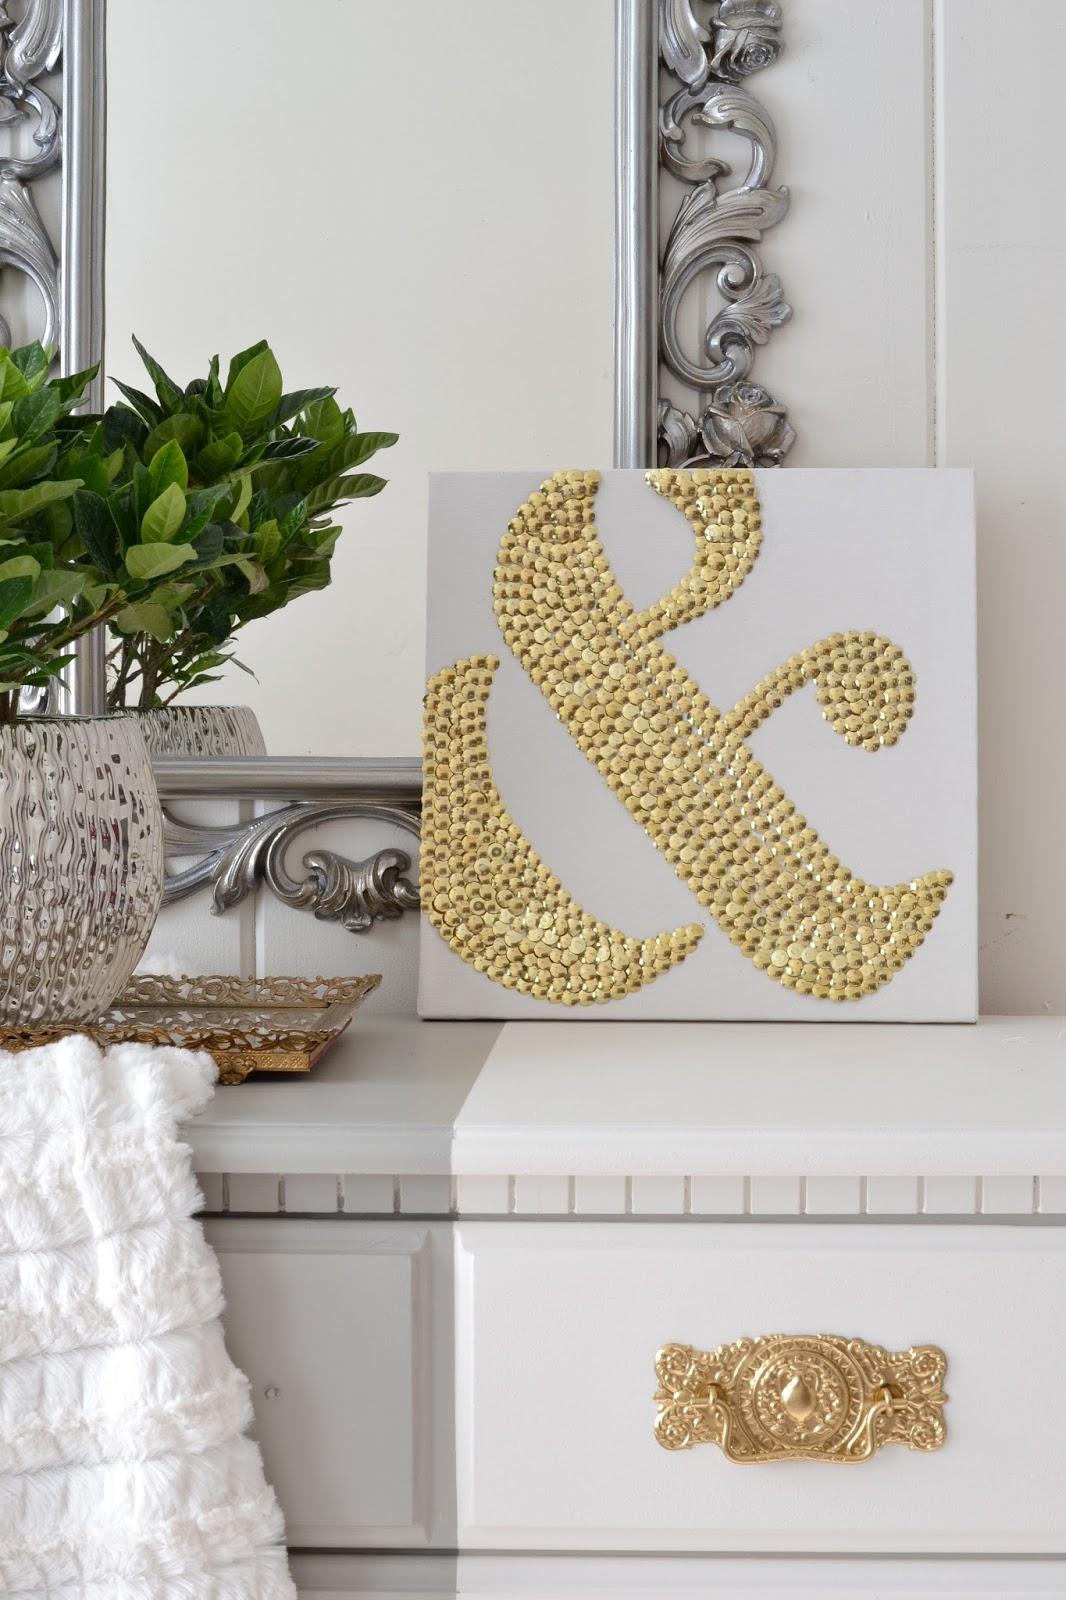 Ampersand Art